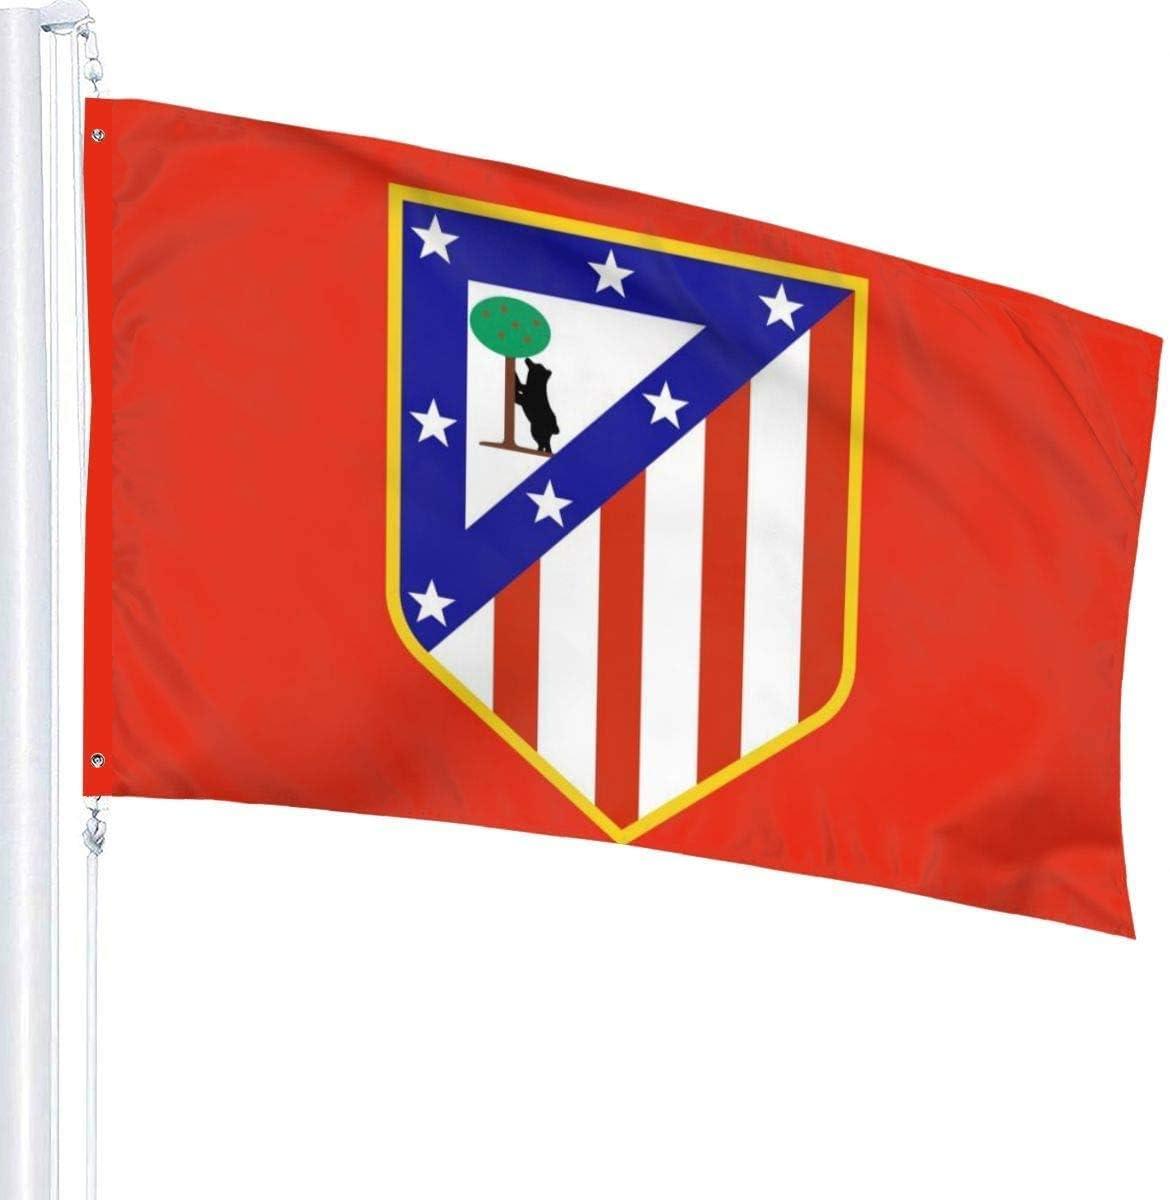 Atletico Madrid Vs Valencia Flags 3x5 Feet Garden House Outdoor Banners Decorative Flag Viplili Banderas